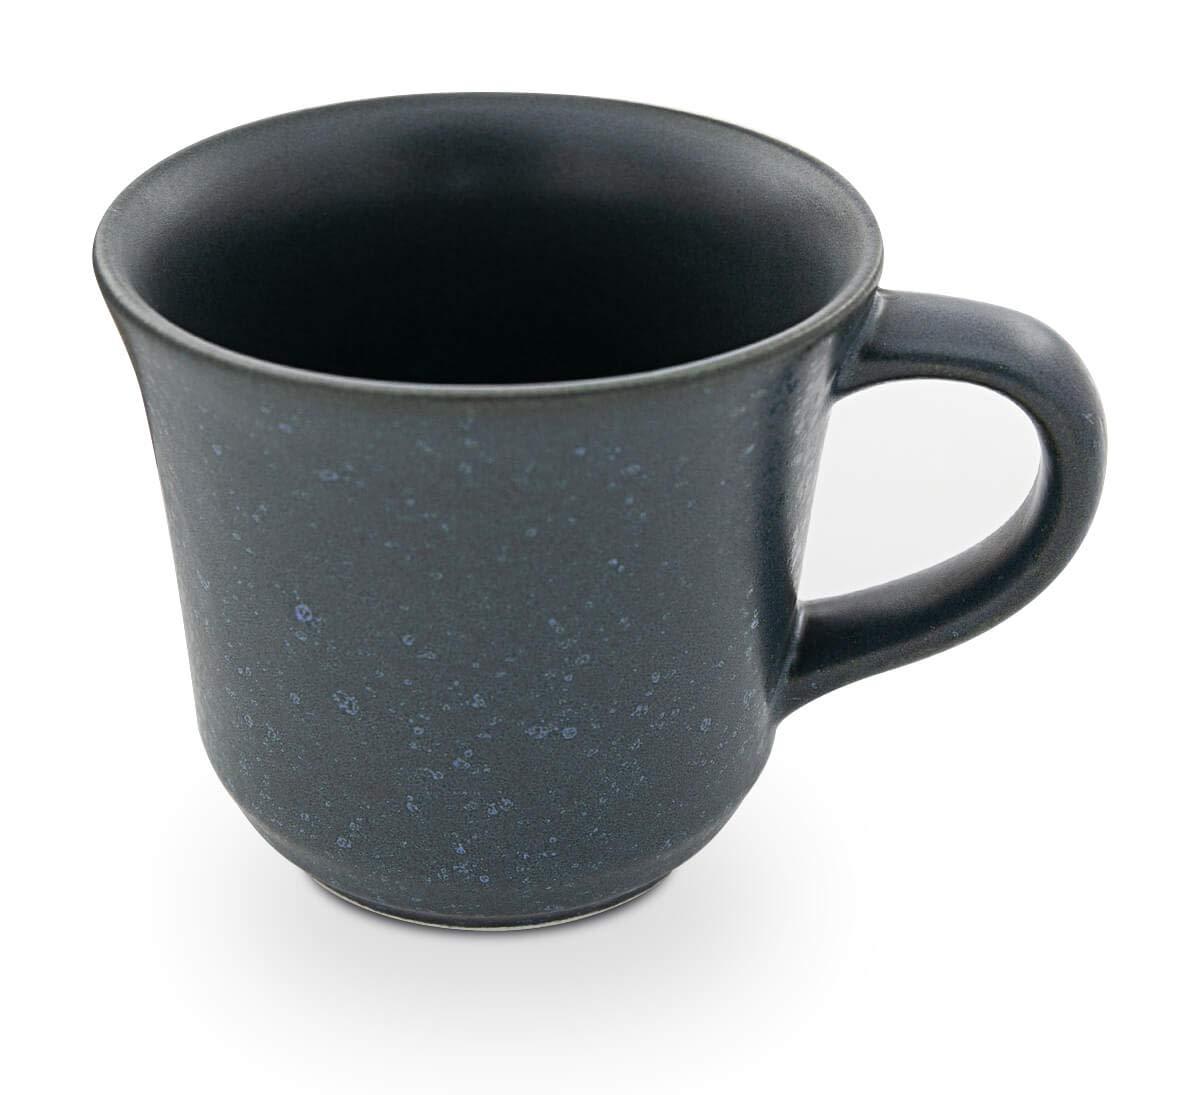 Boleslawiec Pottery Mug, 0.50 L, Original Bunzlauer Keramik, Decor ZIELON (Green)